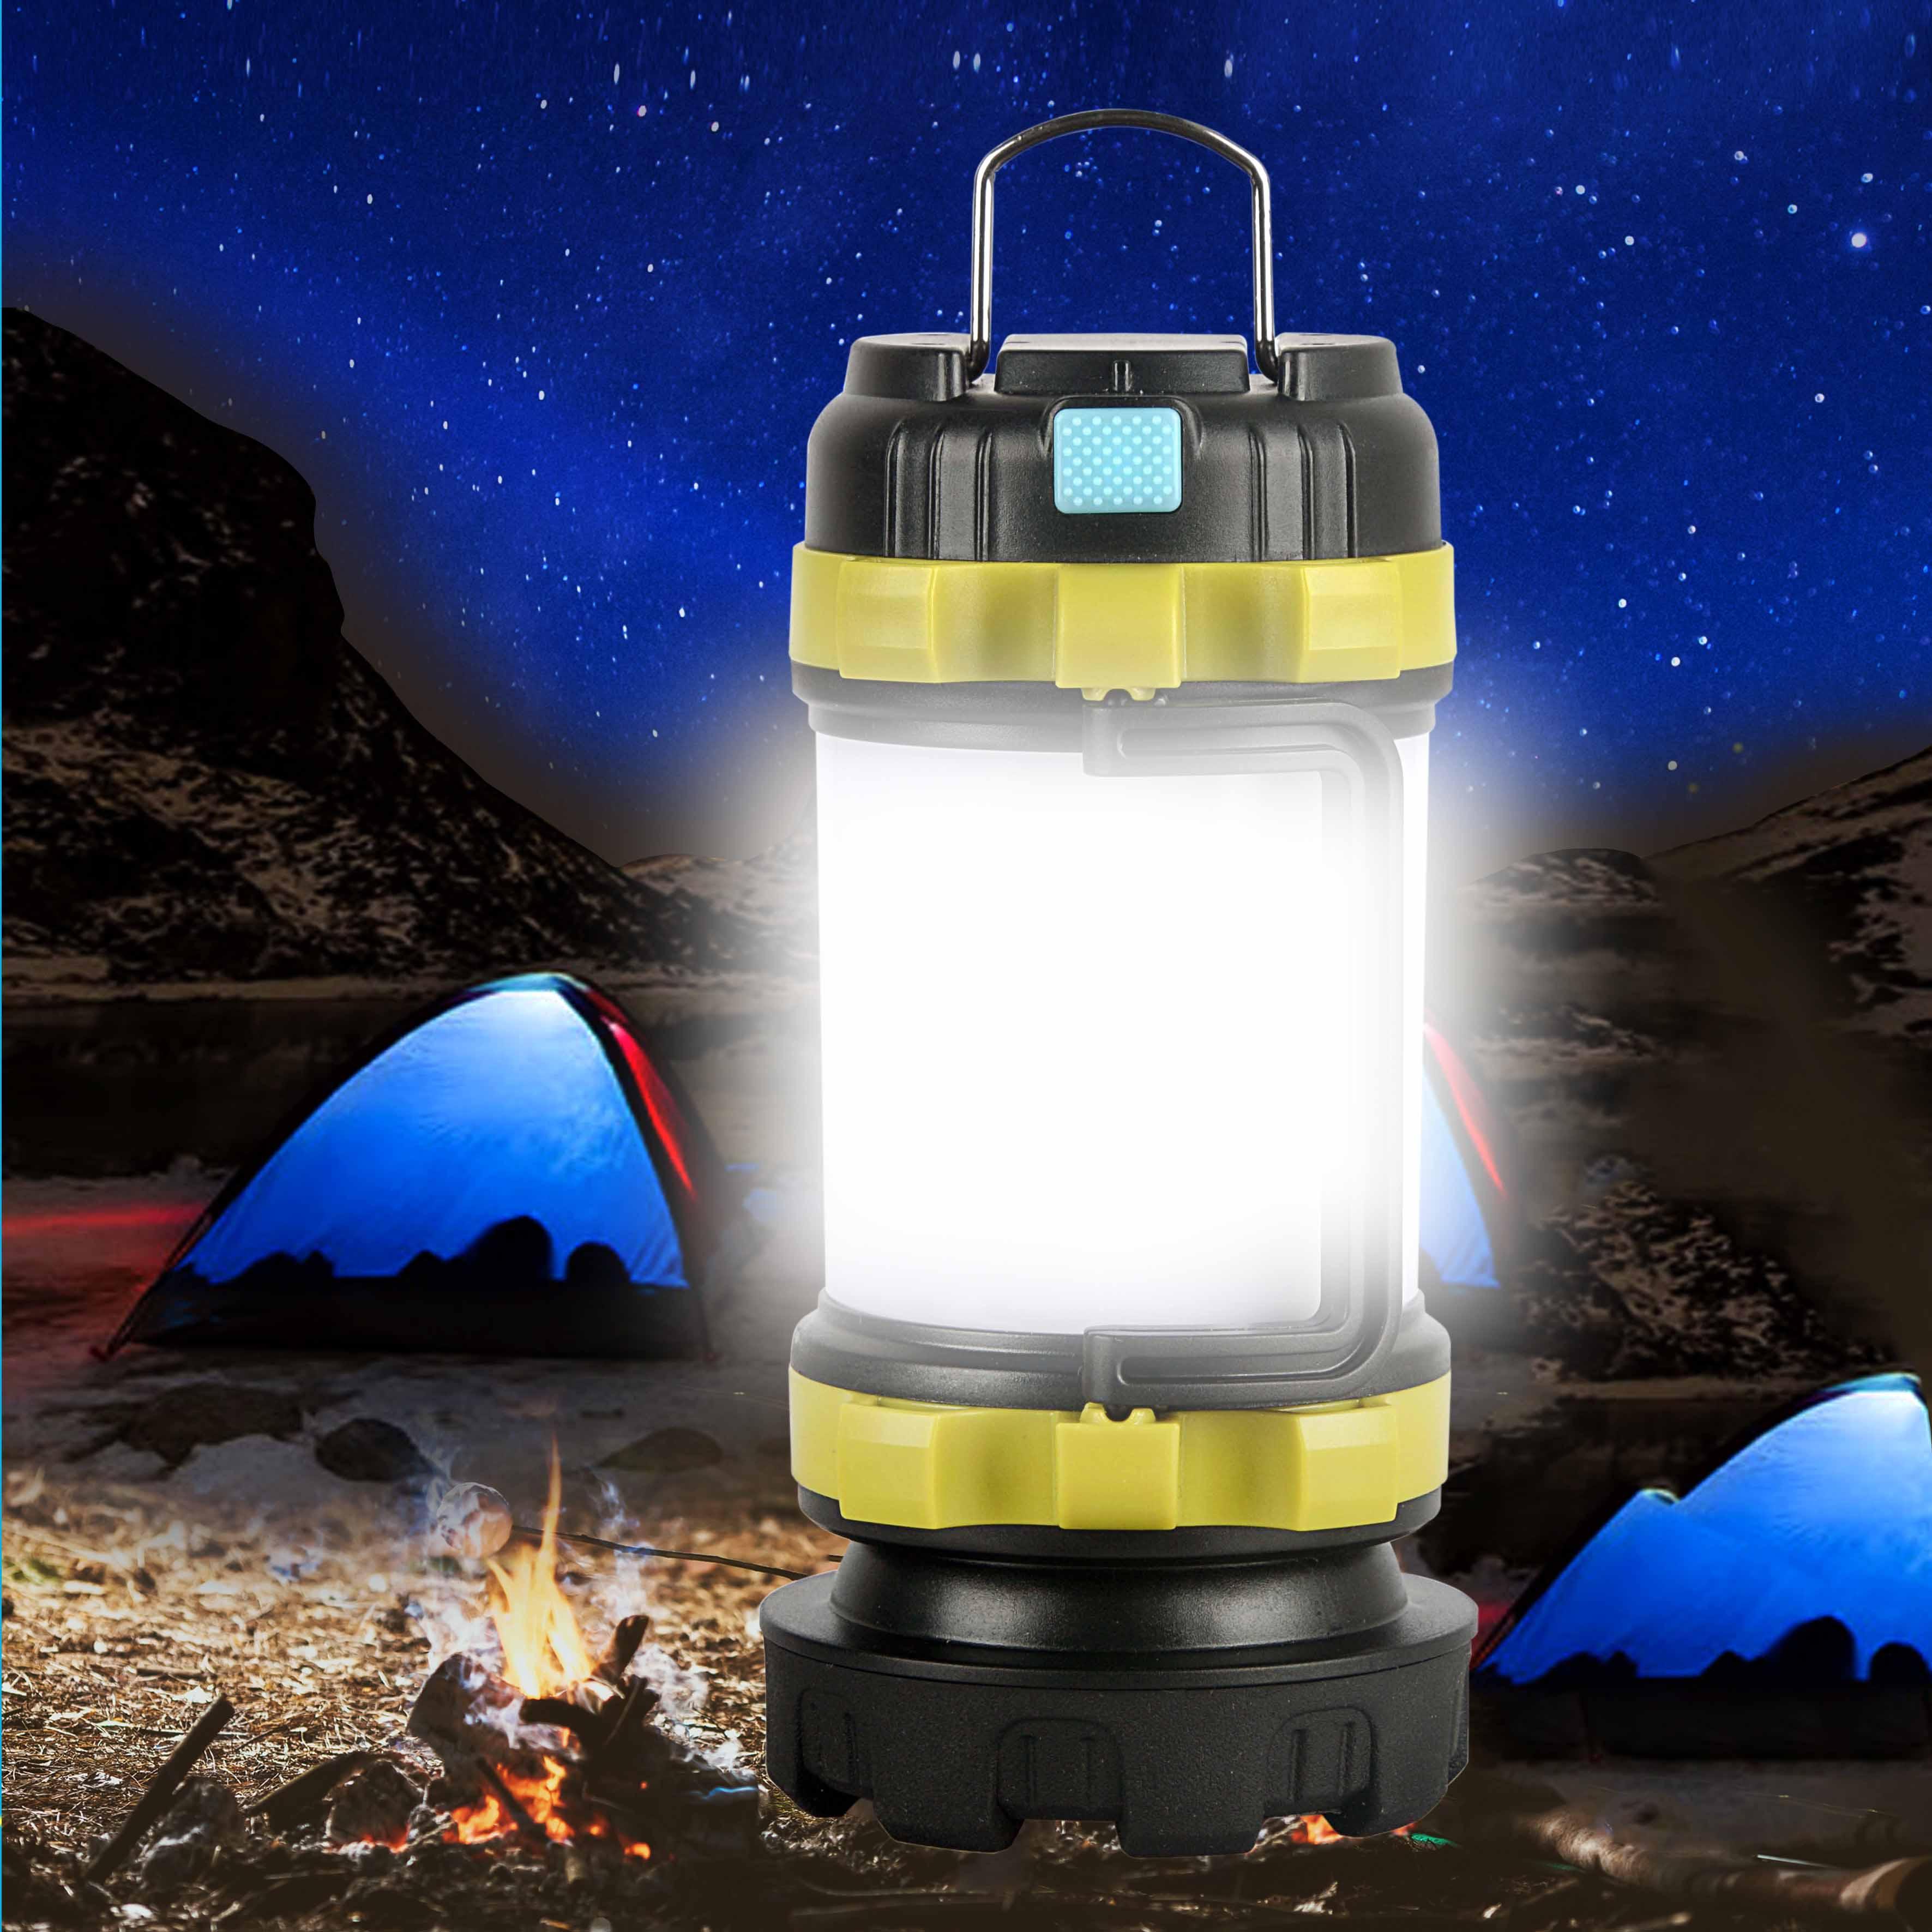 Outdoor Lamp Led Camping Licht Usb Oplaadbare Zaklamp Dimbare Spotlight Werk Licht Waterdicht Zoeklicht Nood Om